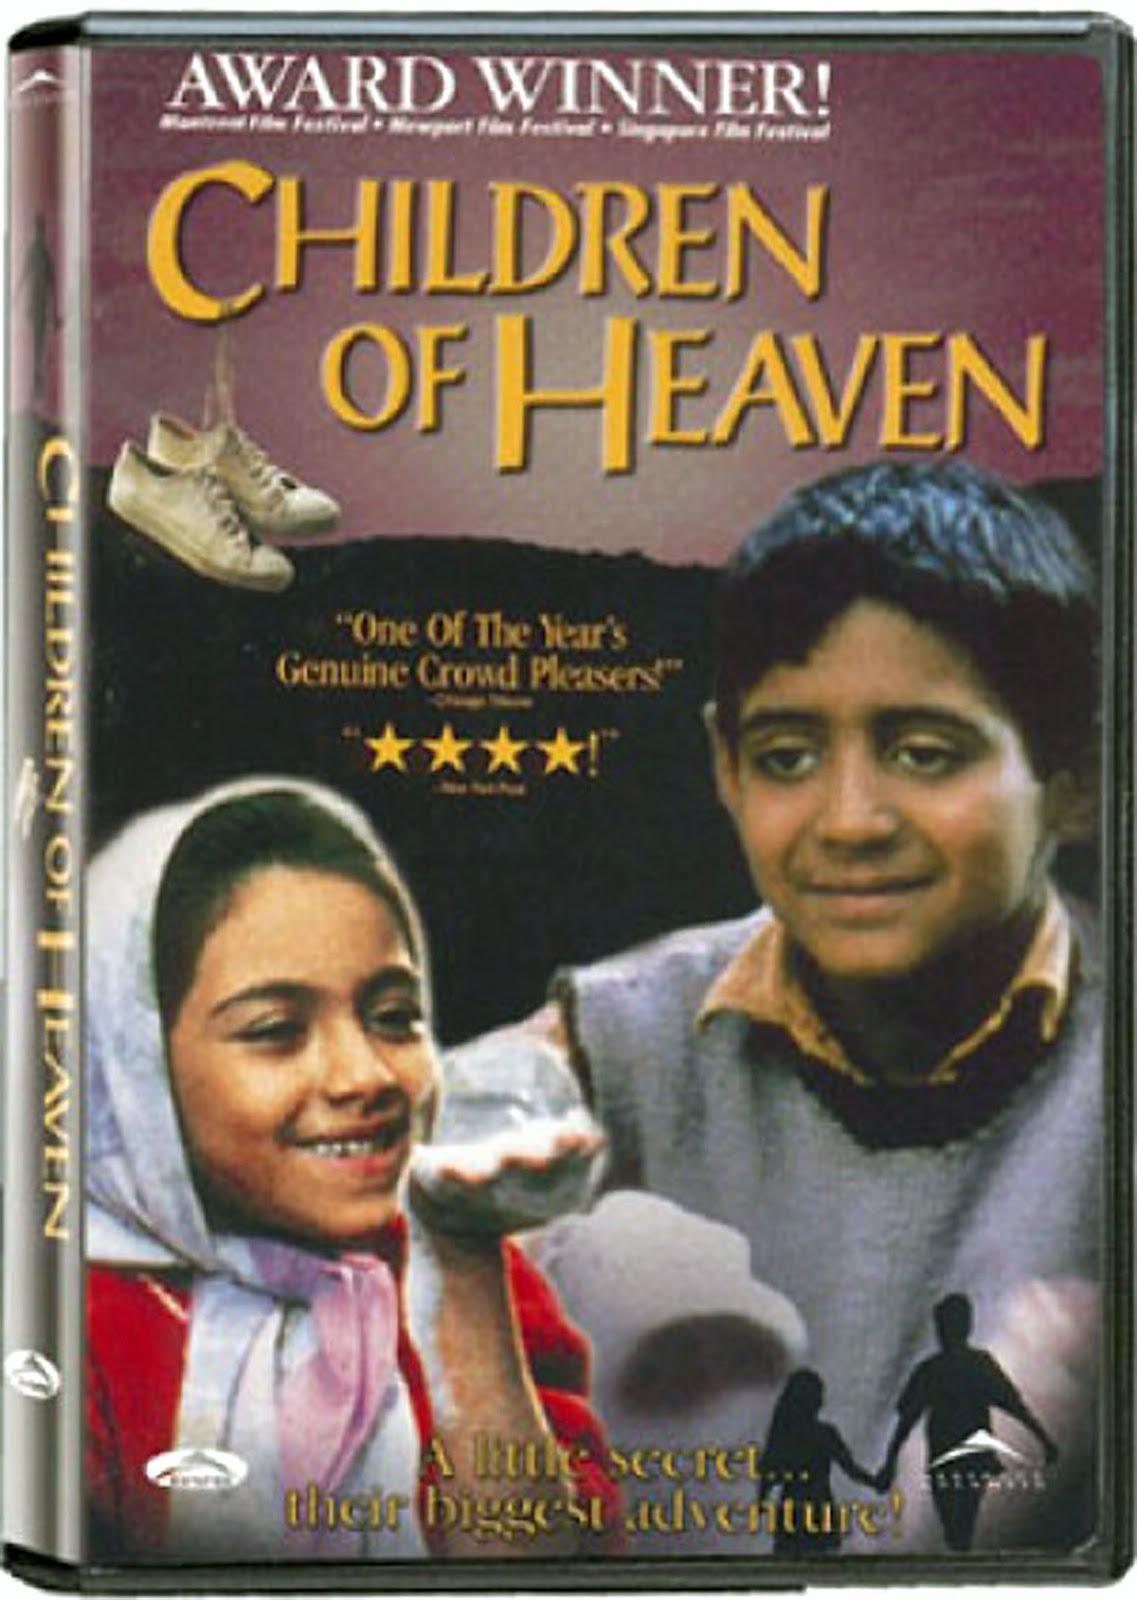 Children of Heaven Blu-ray Dvd Case